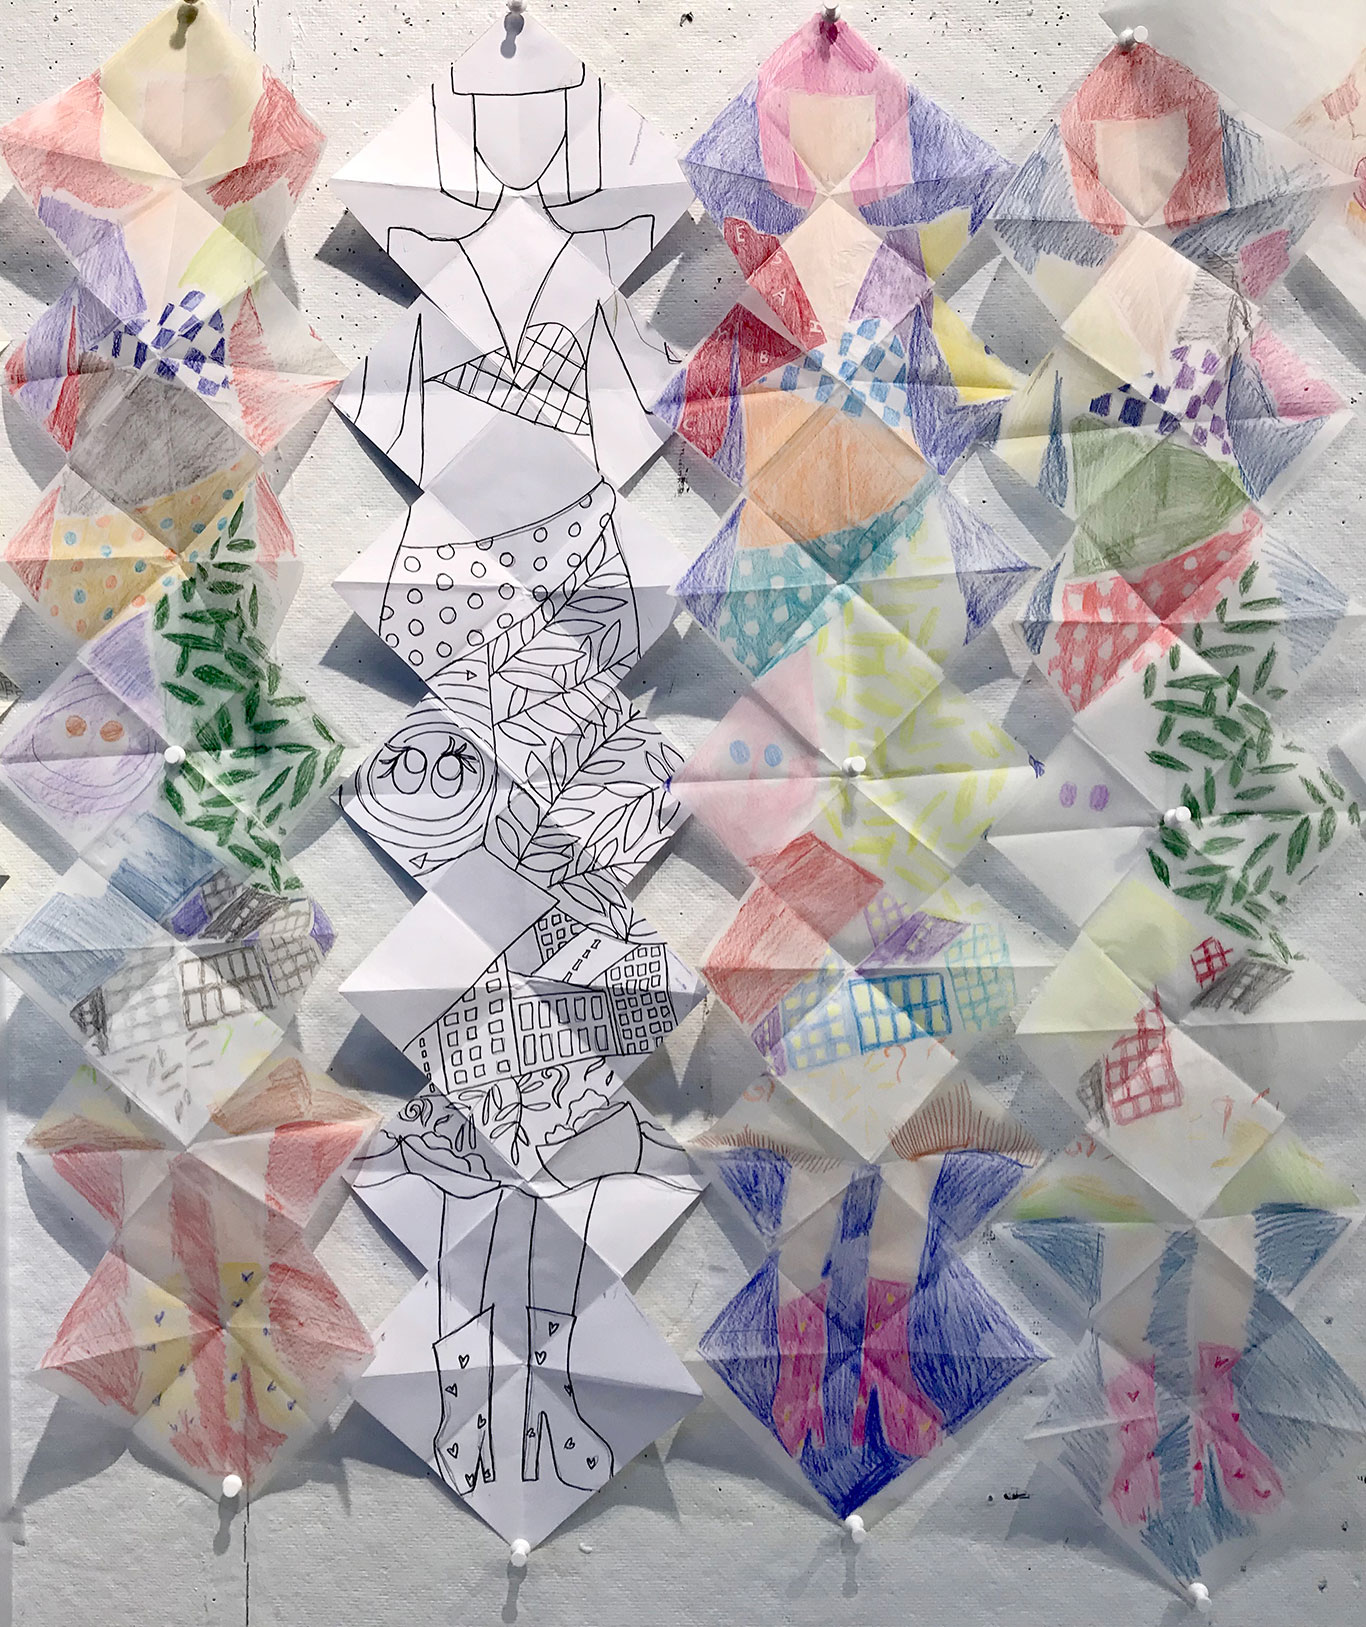 Artist Book Colored Pencil Sketches, Anushka Srinivasan